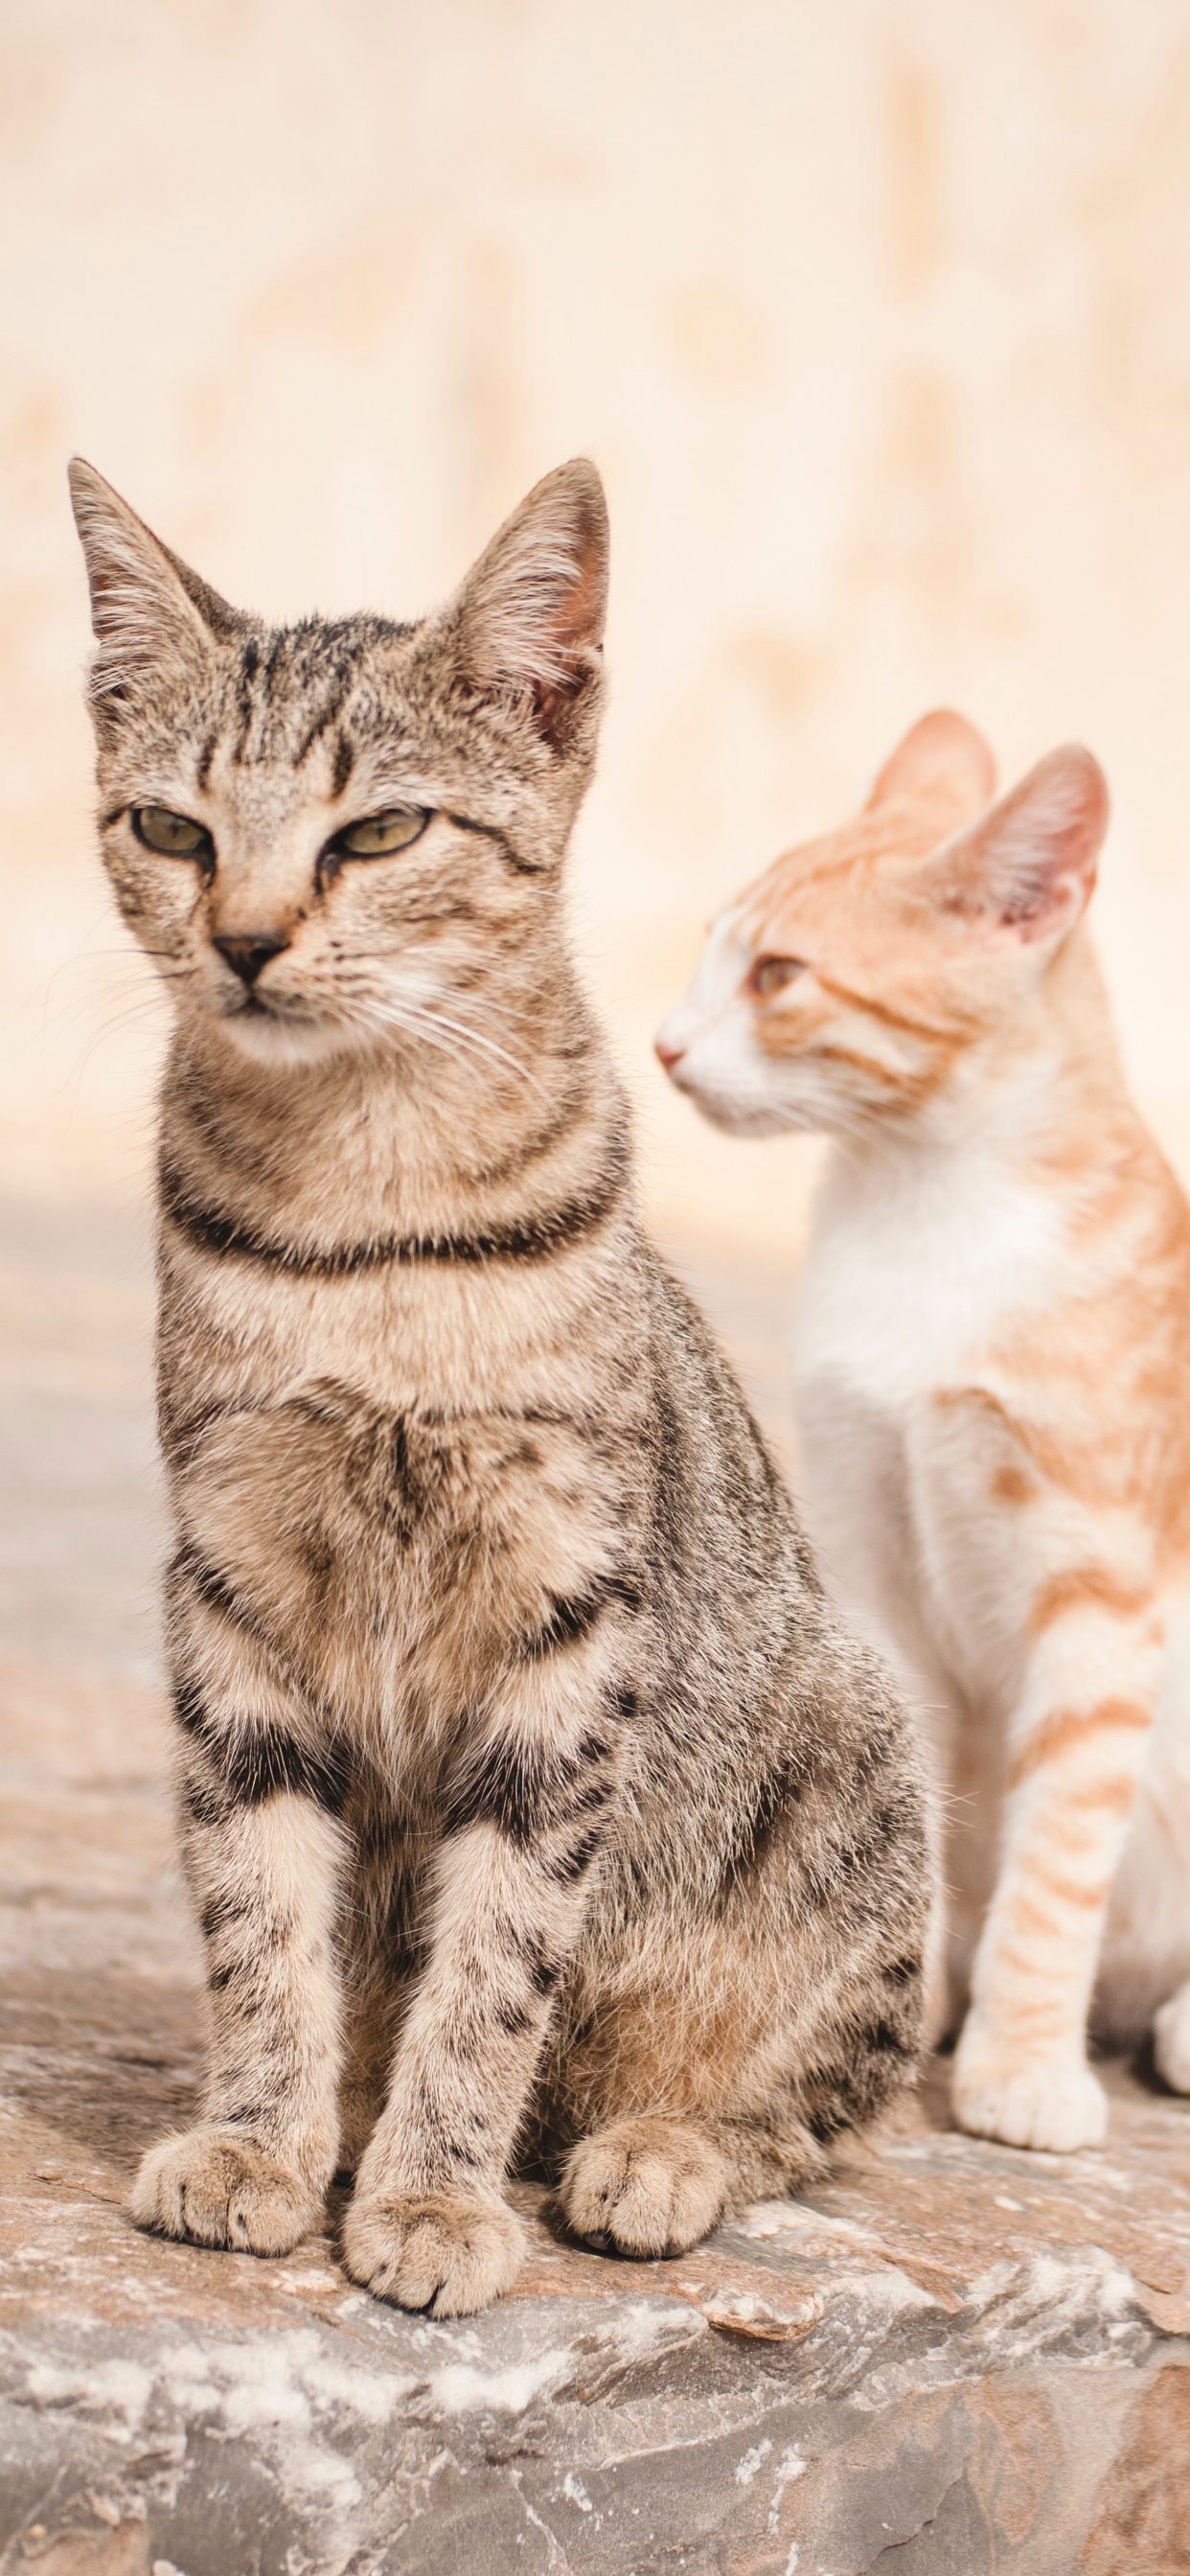 Cute Cat Wallpaper iPhone Backgrounds - Cat T-Shirt Store